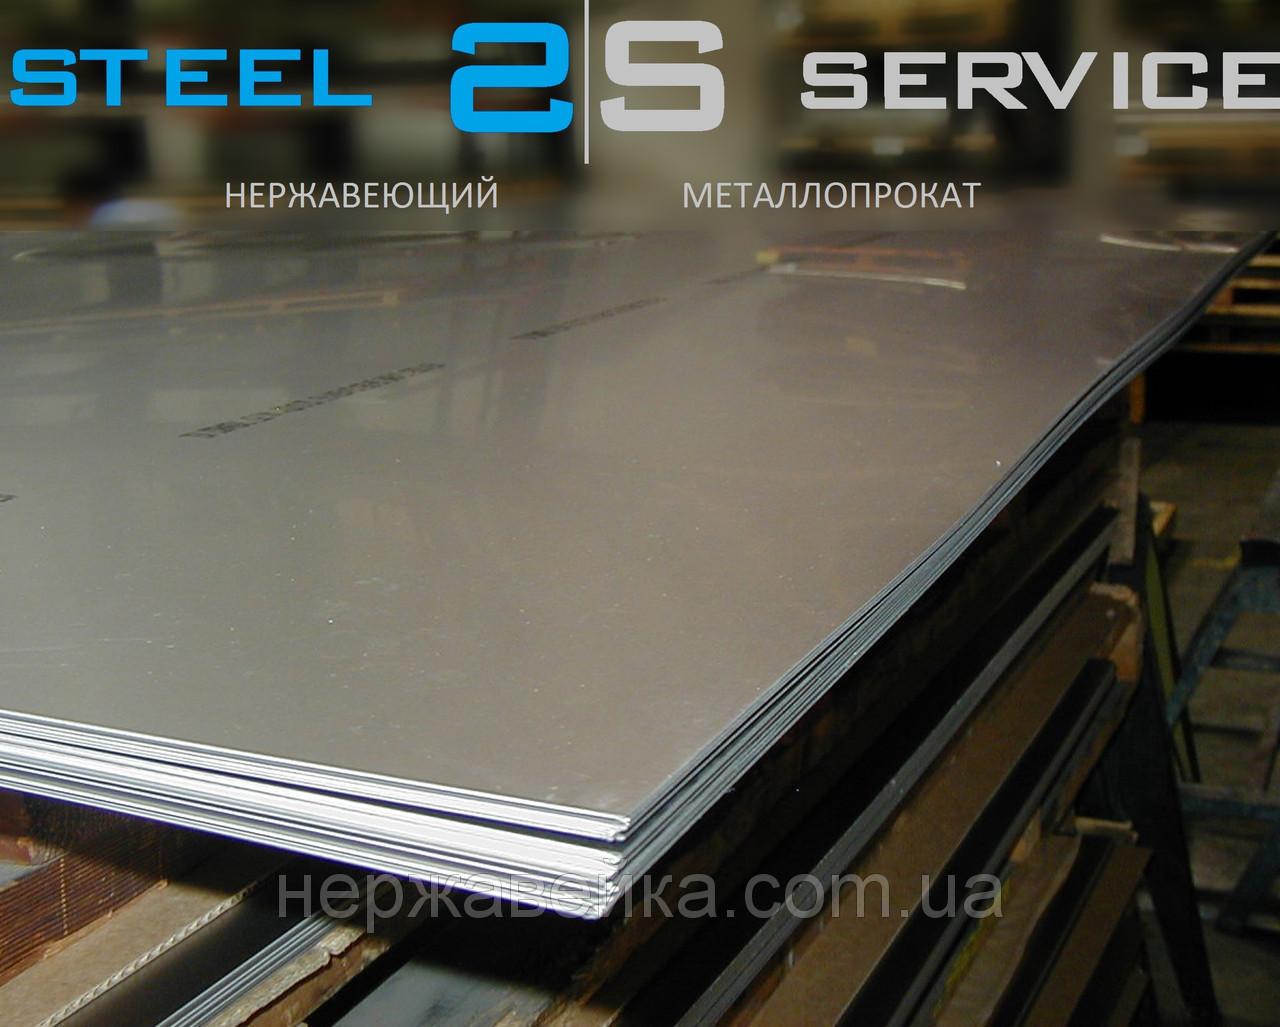 Нержавейка лист 3х1500х6000мм AISI 410S(08Х13) F1 - горячекатанный, технический